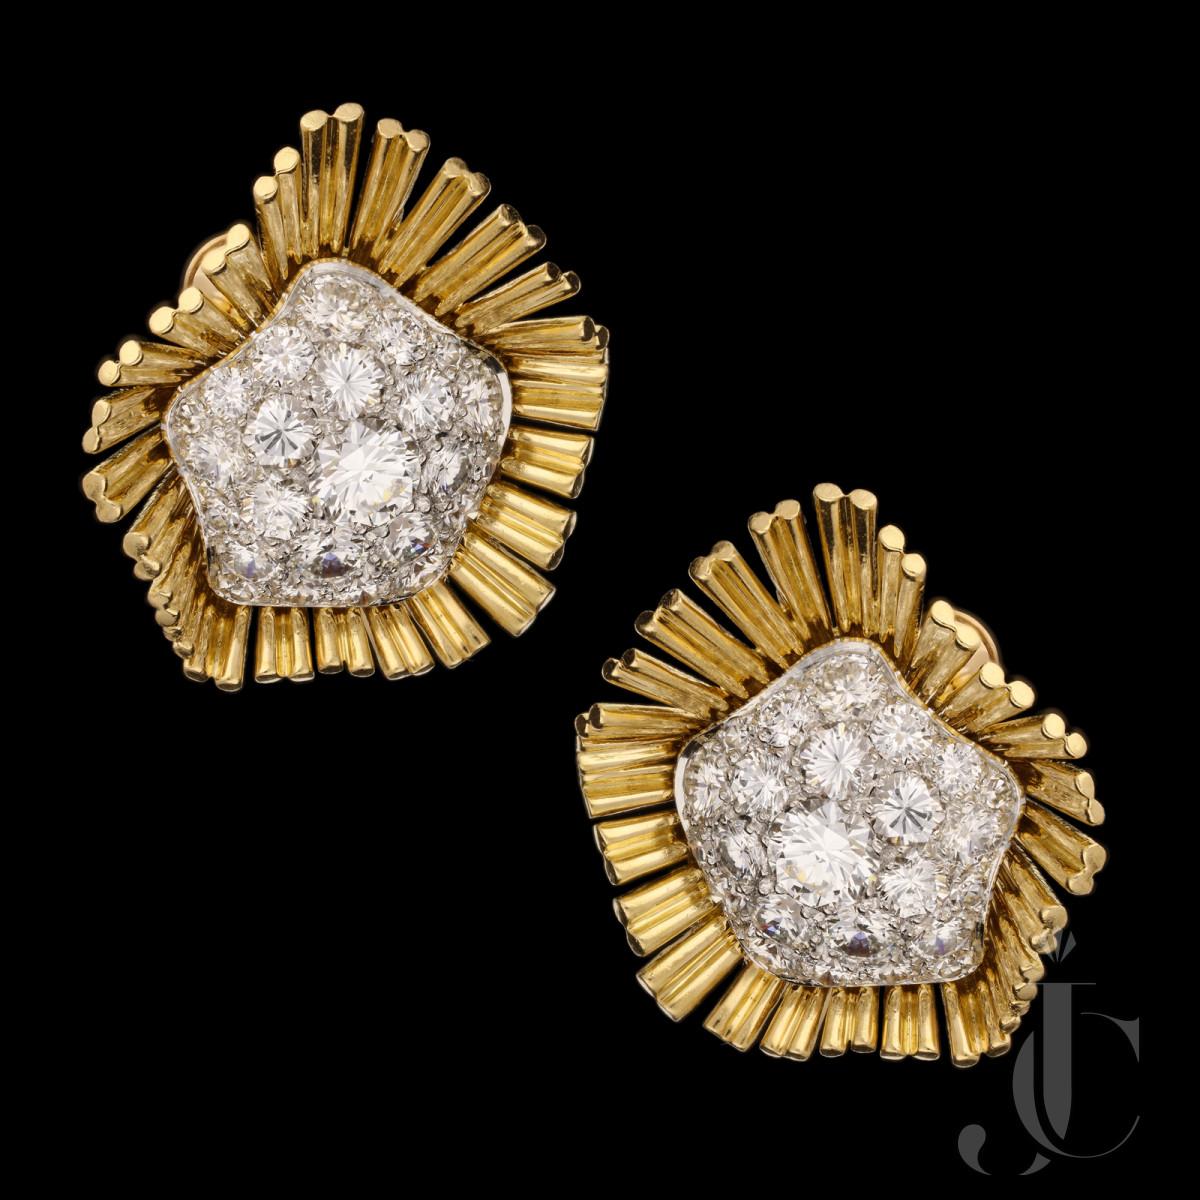 Cartier - Retro Gold & Pave Diamond Earrings c.1950s